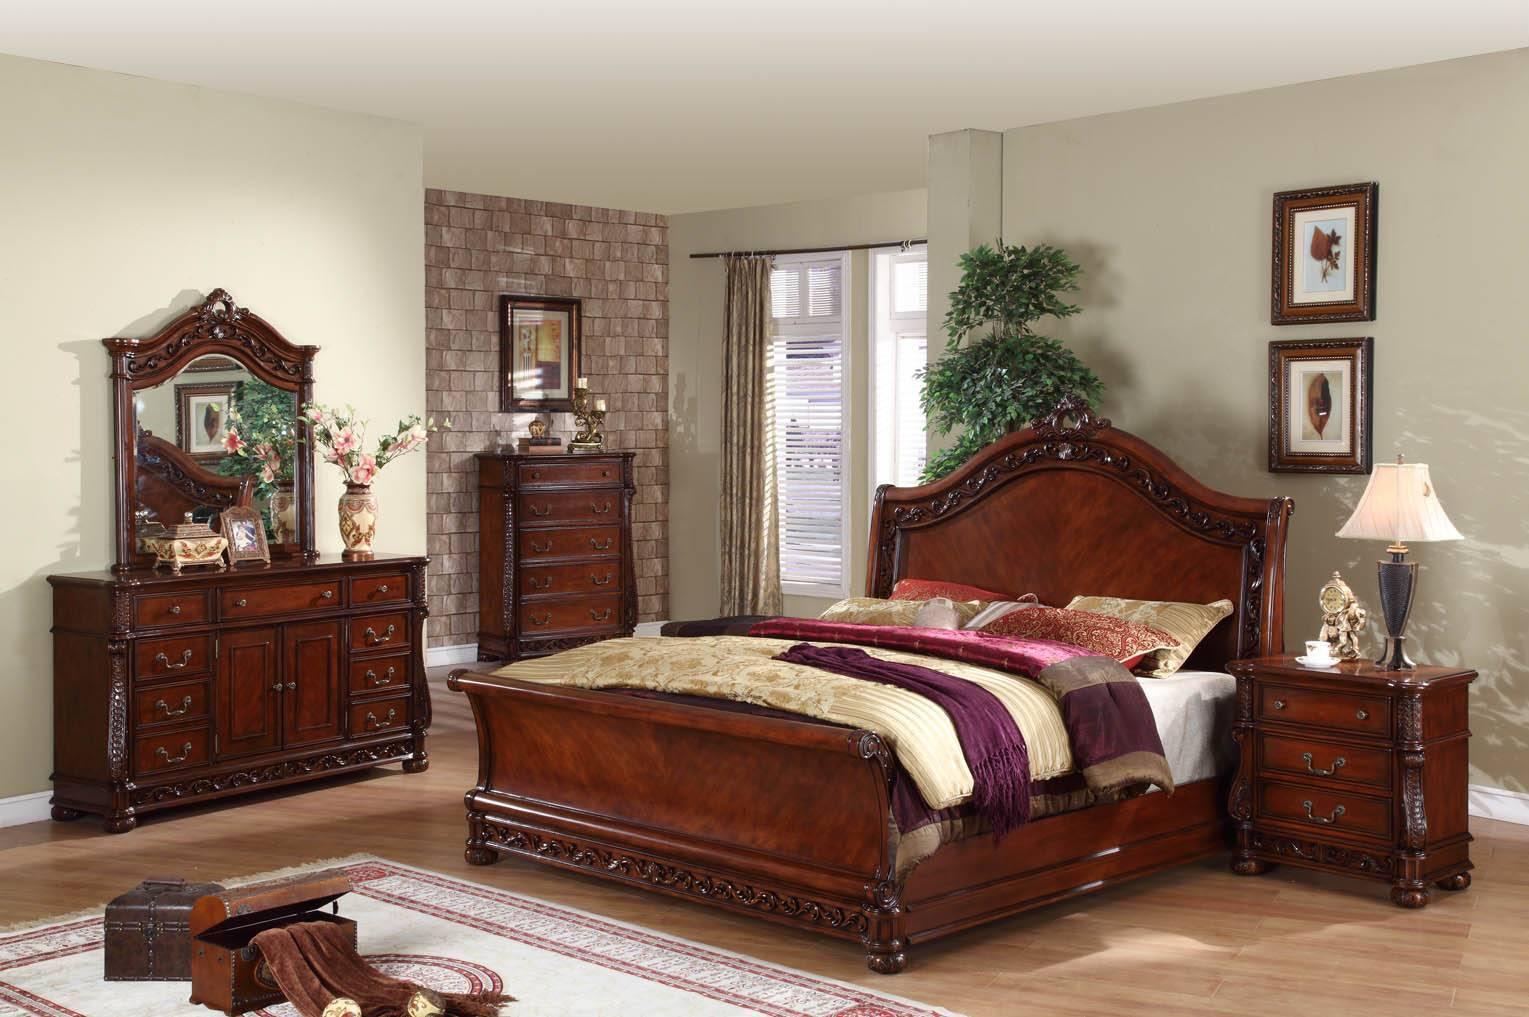 Images of white antique bedroom furniture; white antique bedroom furniture ideas ... antique bedroom furniture